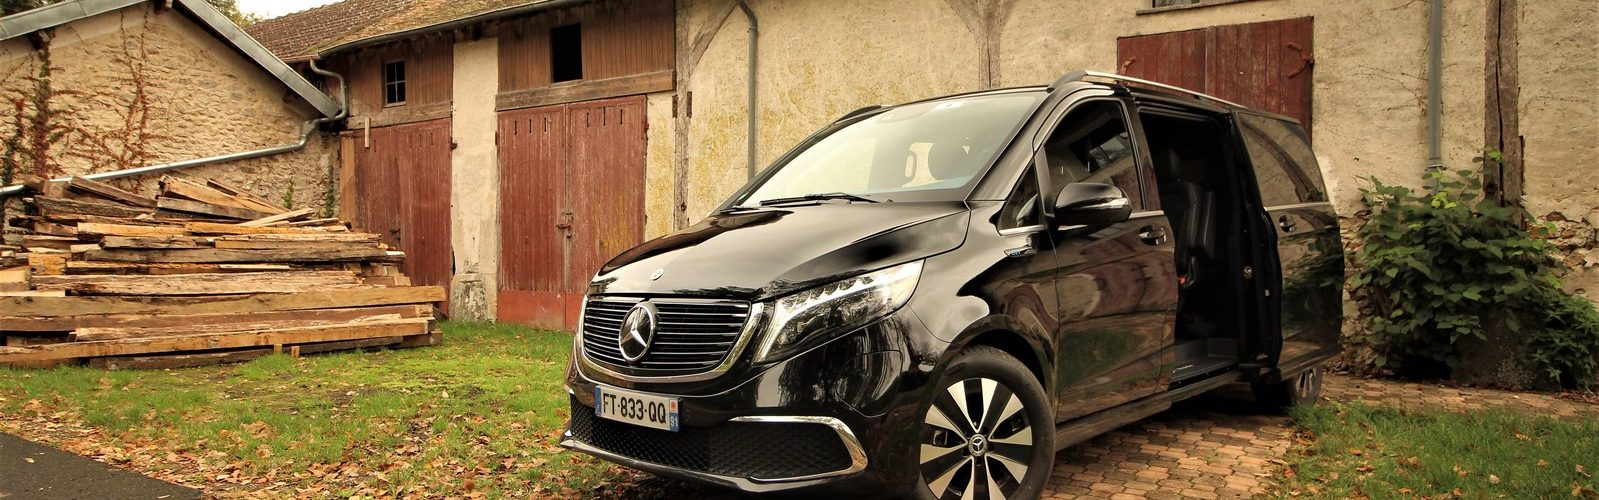 Mercedes Benz EQV Thibaut Dumoulin LNA (39)